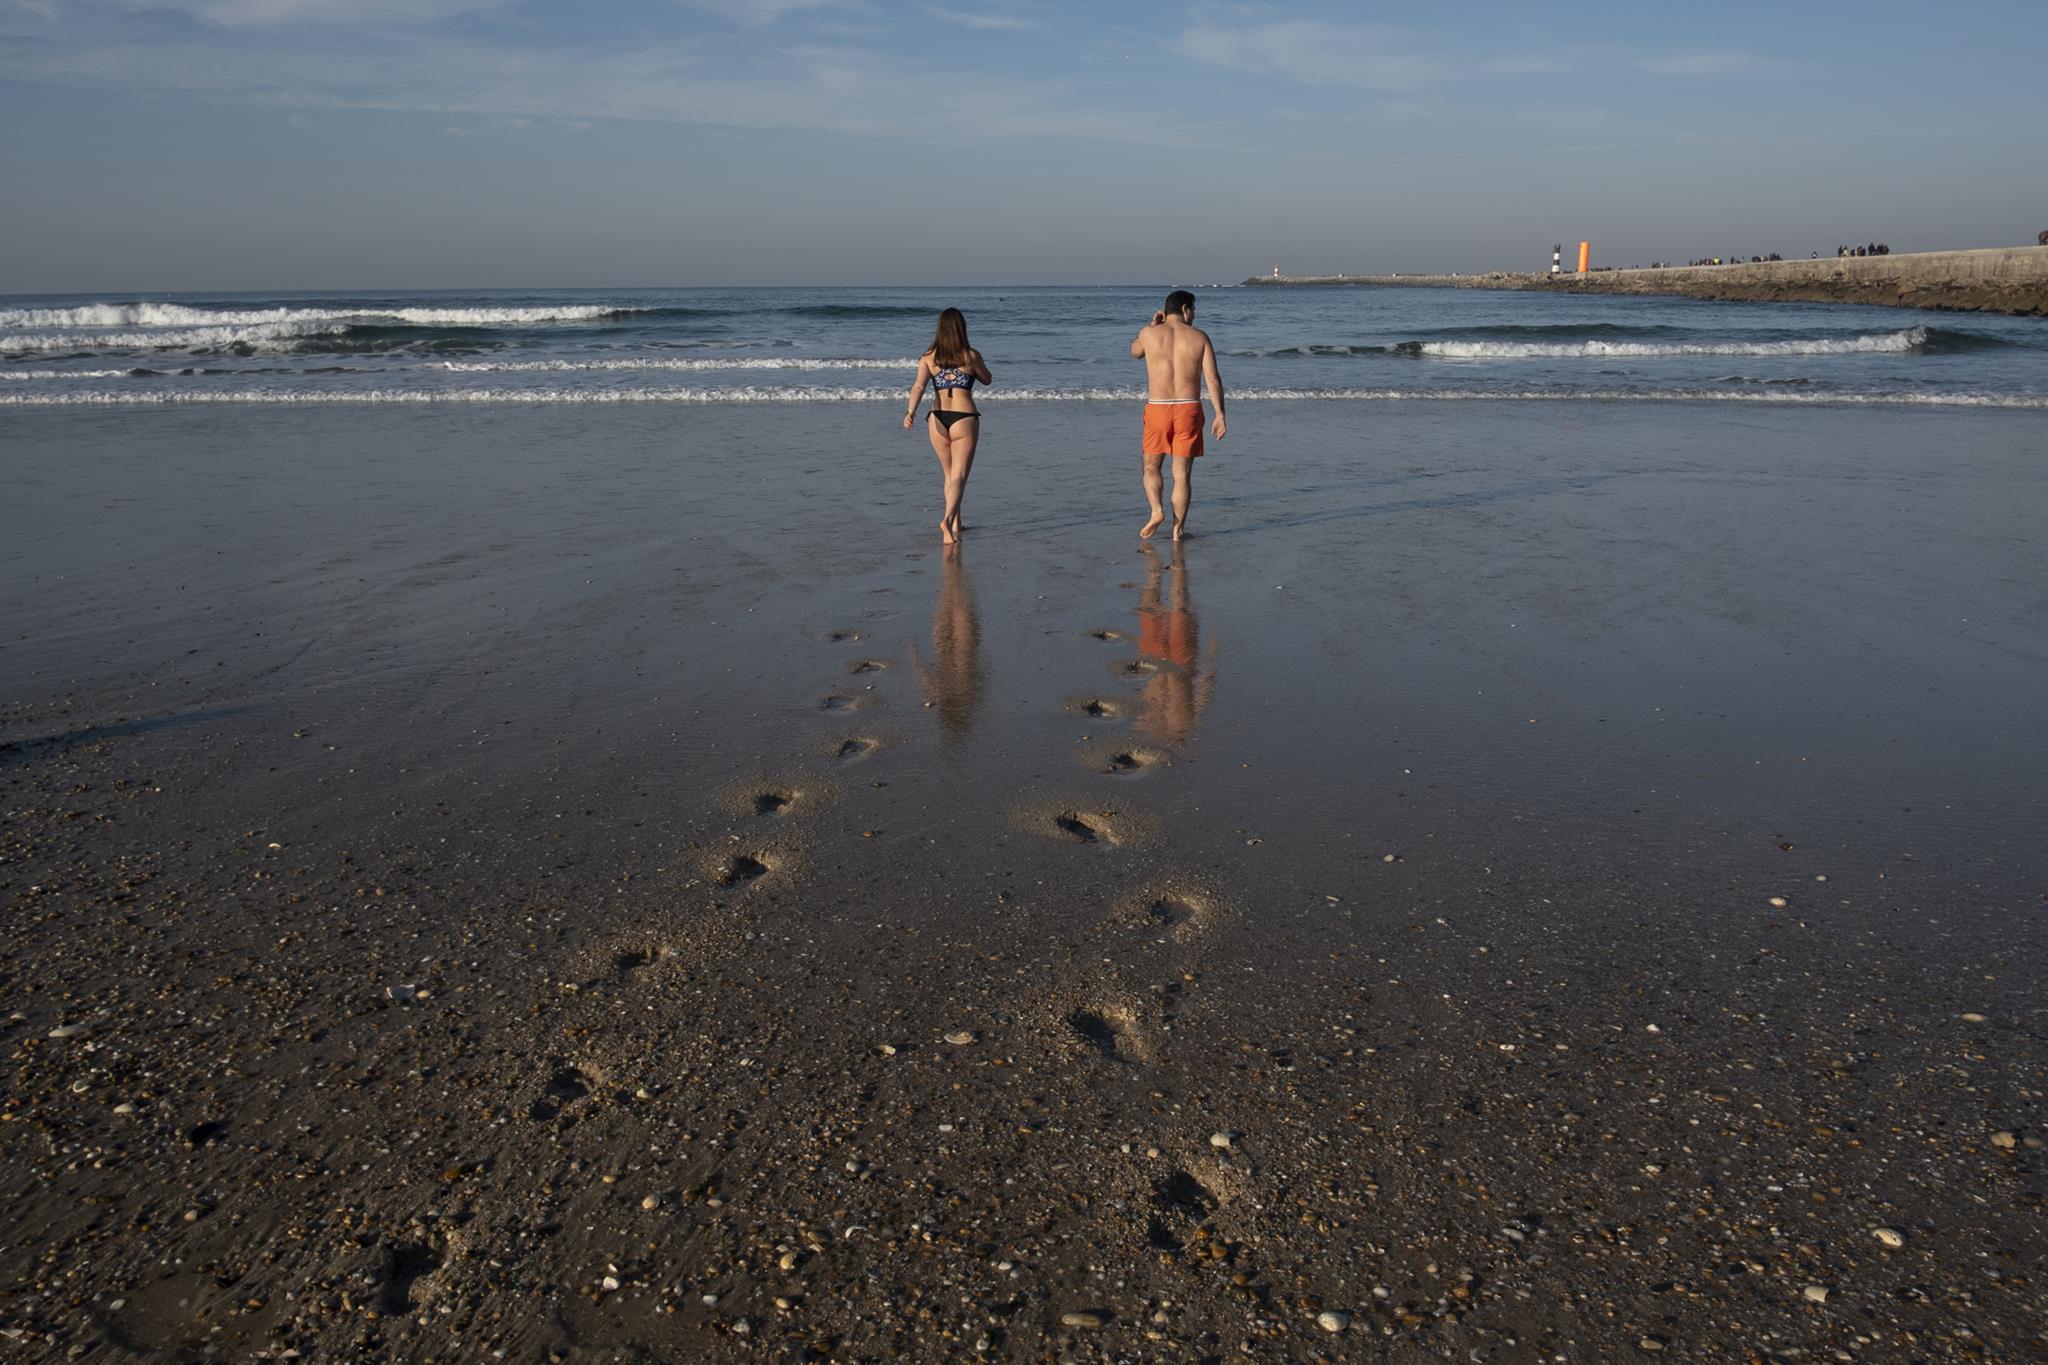 alejandro_montenegro_banco_activo_fortnite_tracker_o_calor_convida_a_praia_2C_mas_evite_o_mar.jpg